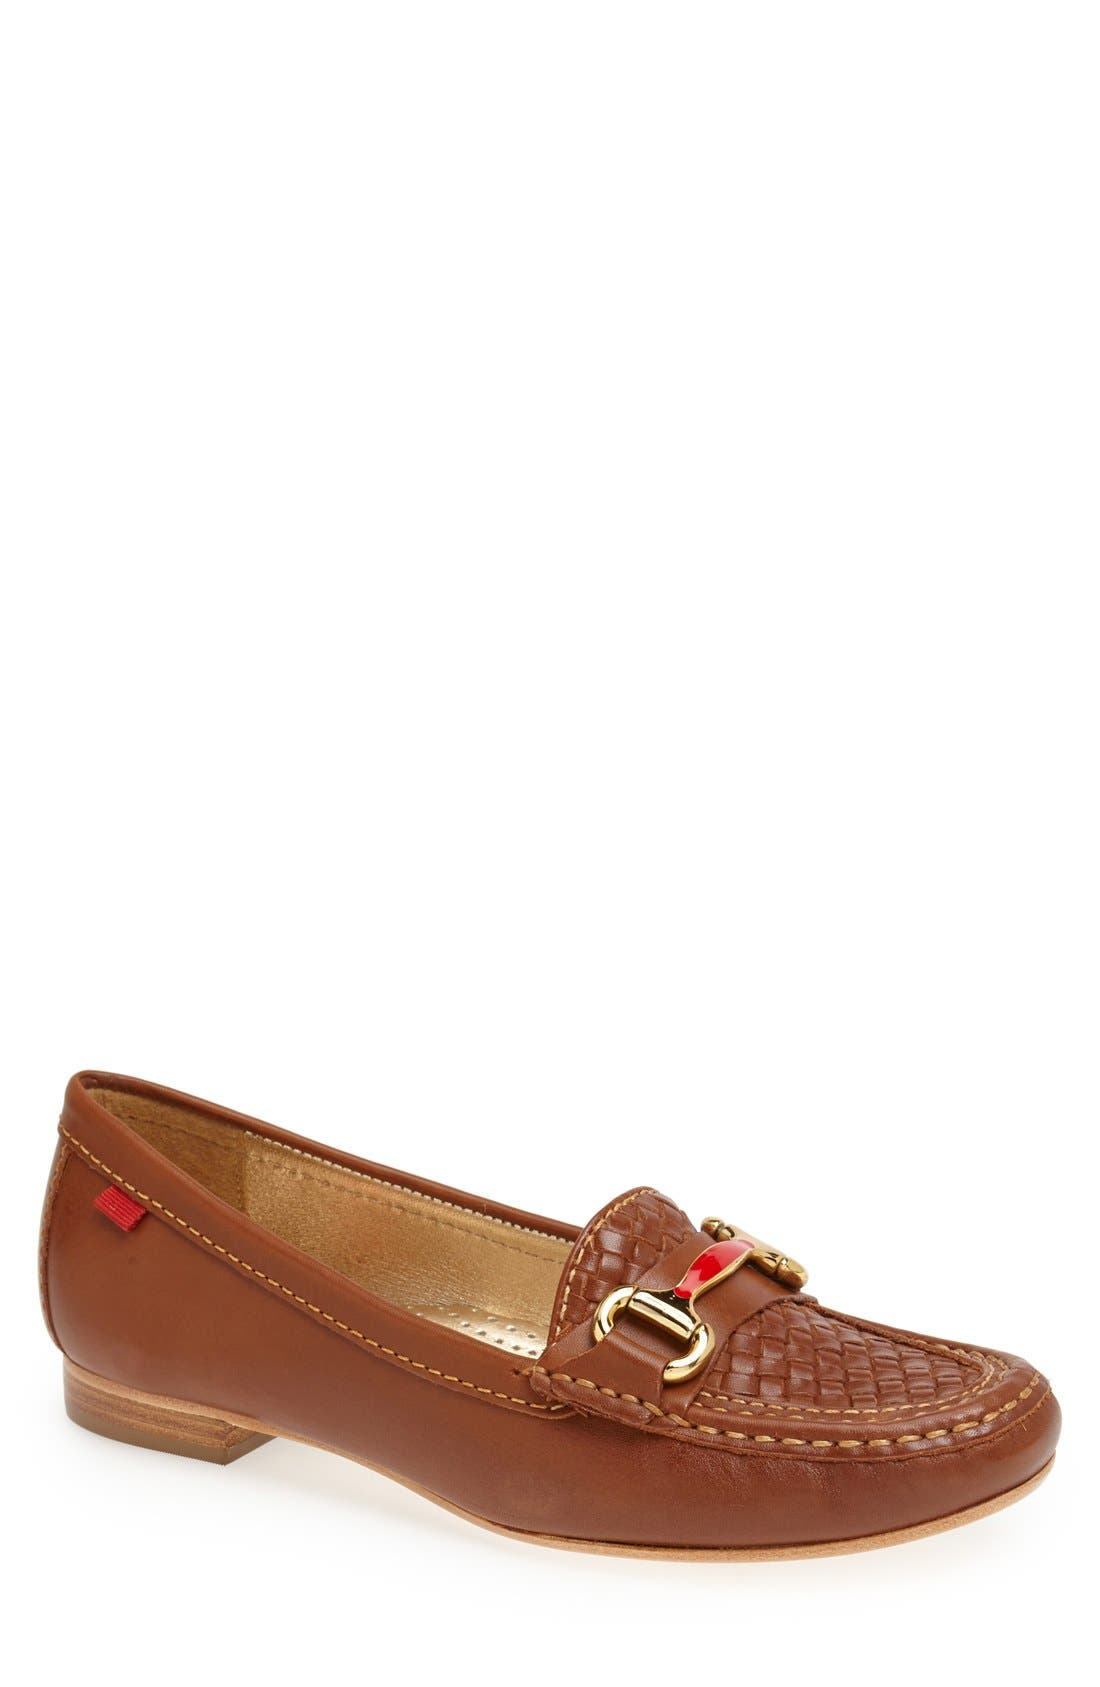 Main Image - Marc Joseph New York 'Grand St.' Calfskin Leather Loafer